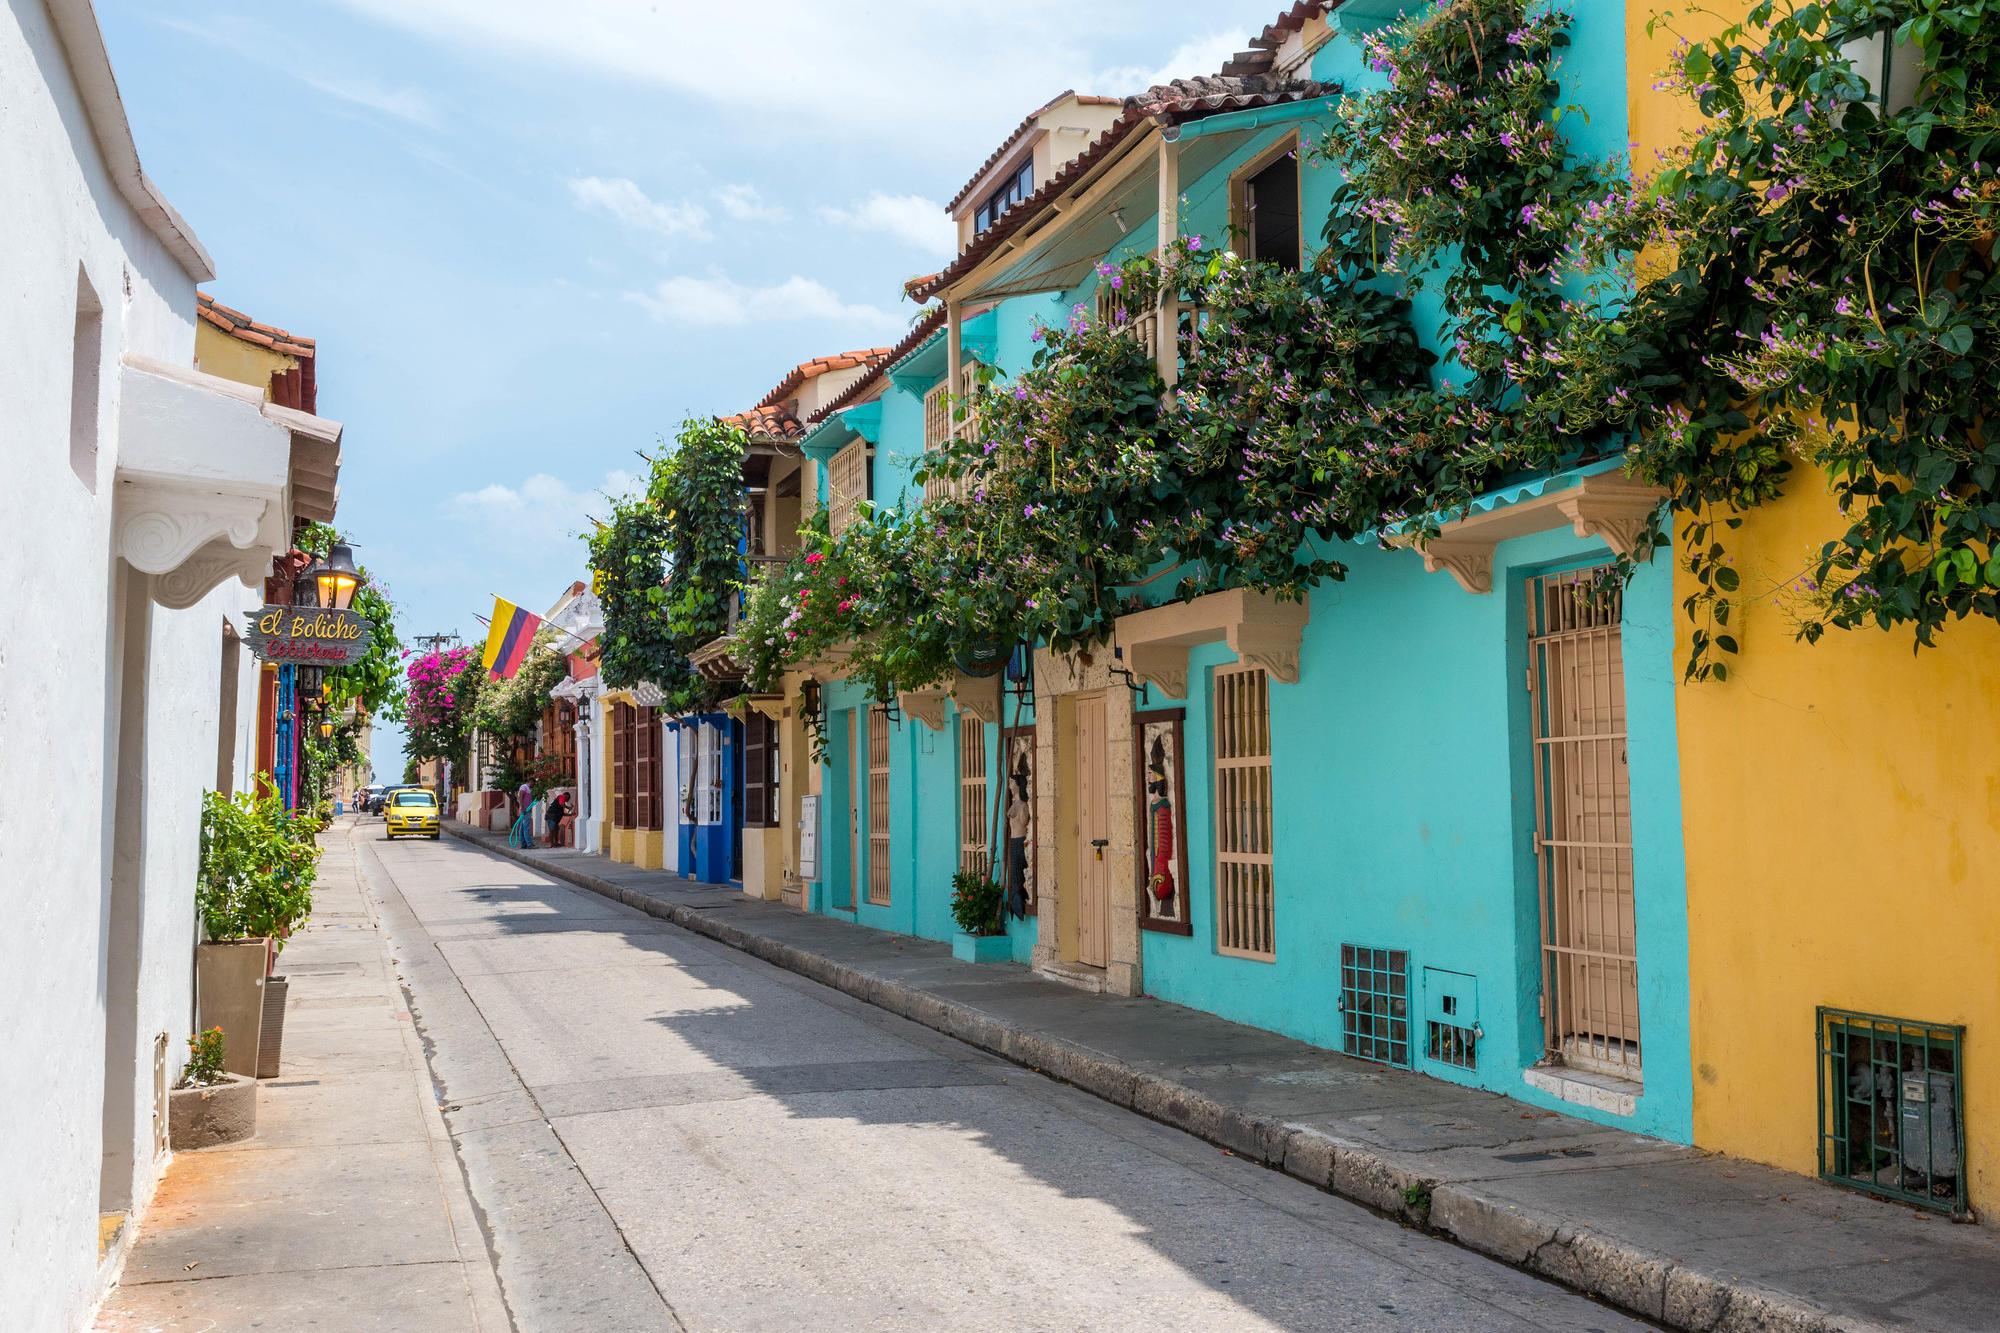 Walled City, Cartagena, Colombia